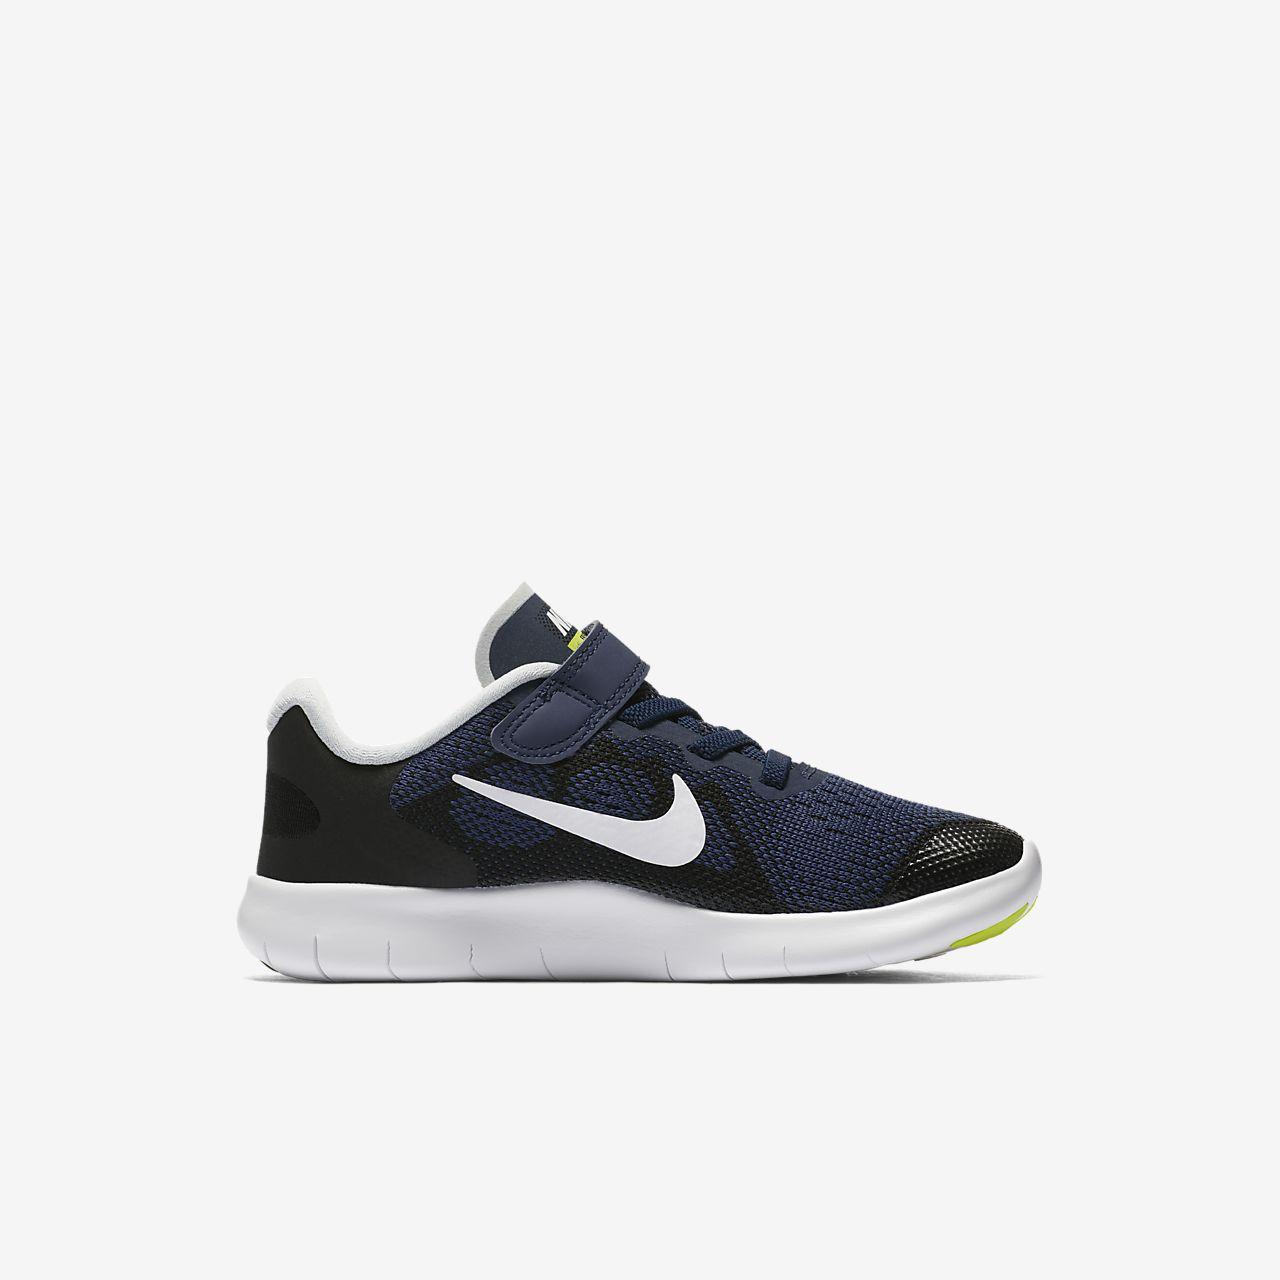 ... Nike Free RN 2017 Little Kids' Running Shoe